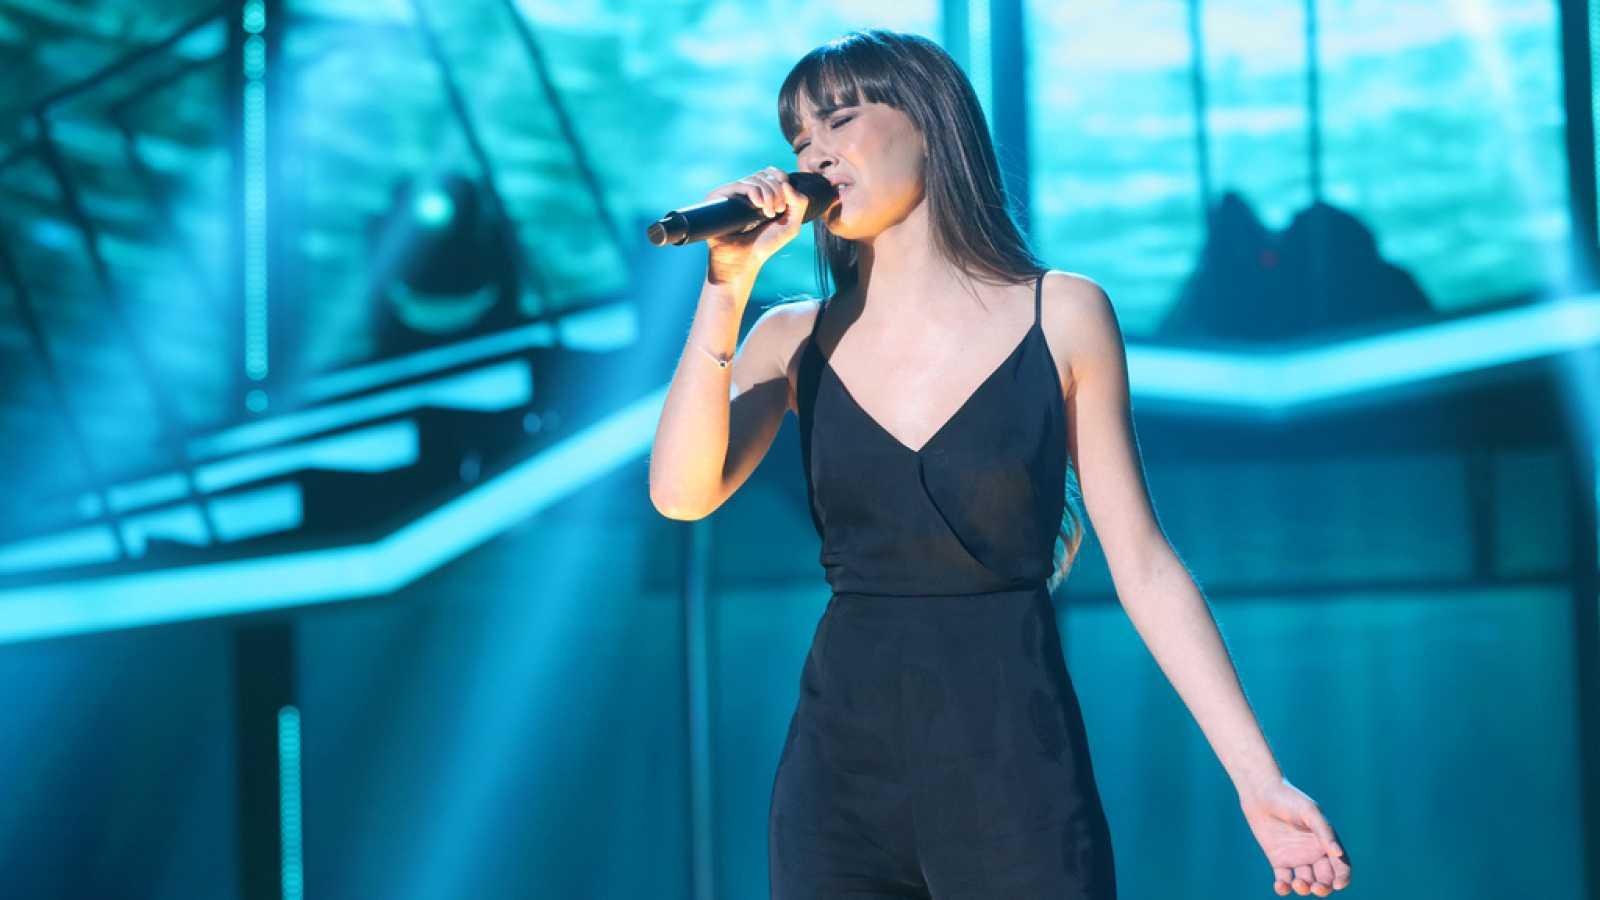 c34253ea8e Para todos los públicos Operación Triunfo - Aitana canta  Chandelier  en la  Gala Final de OT reproducir video